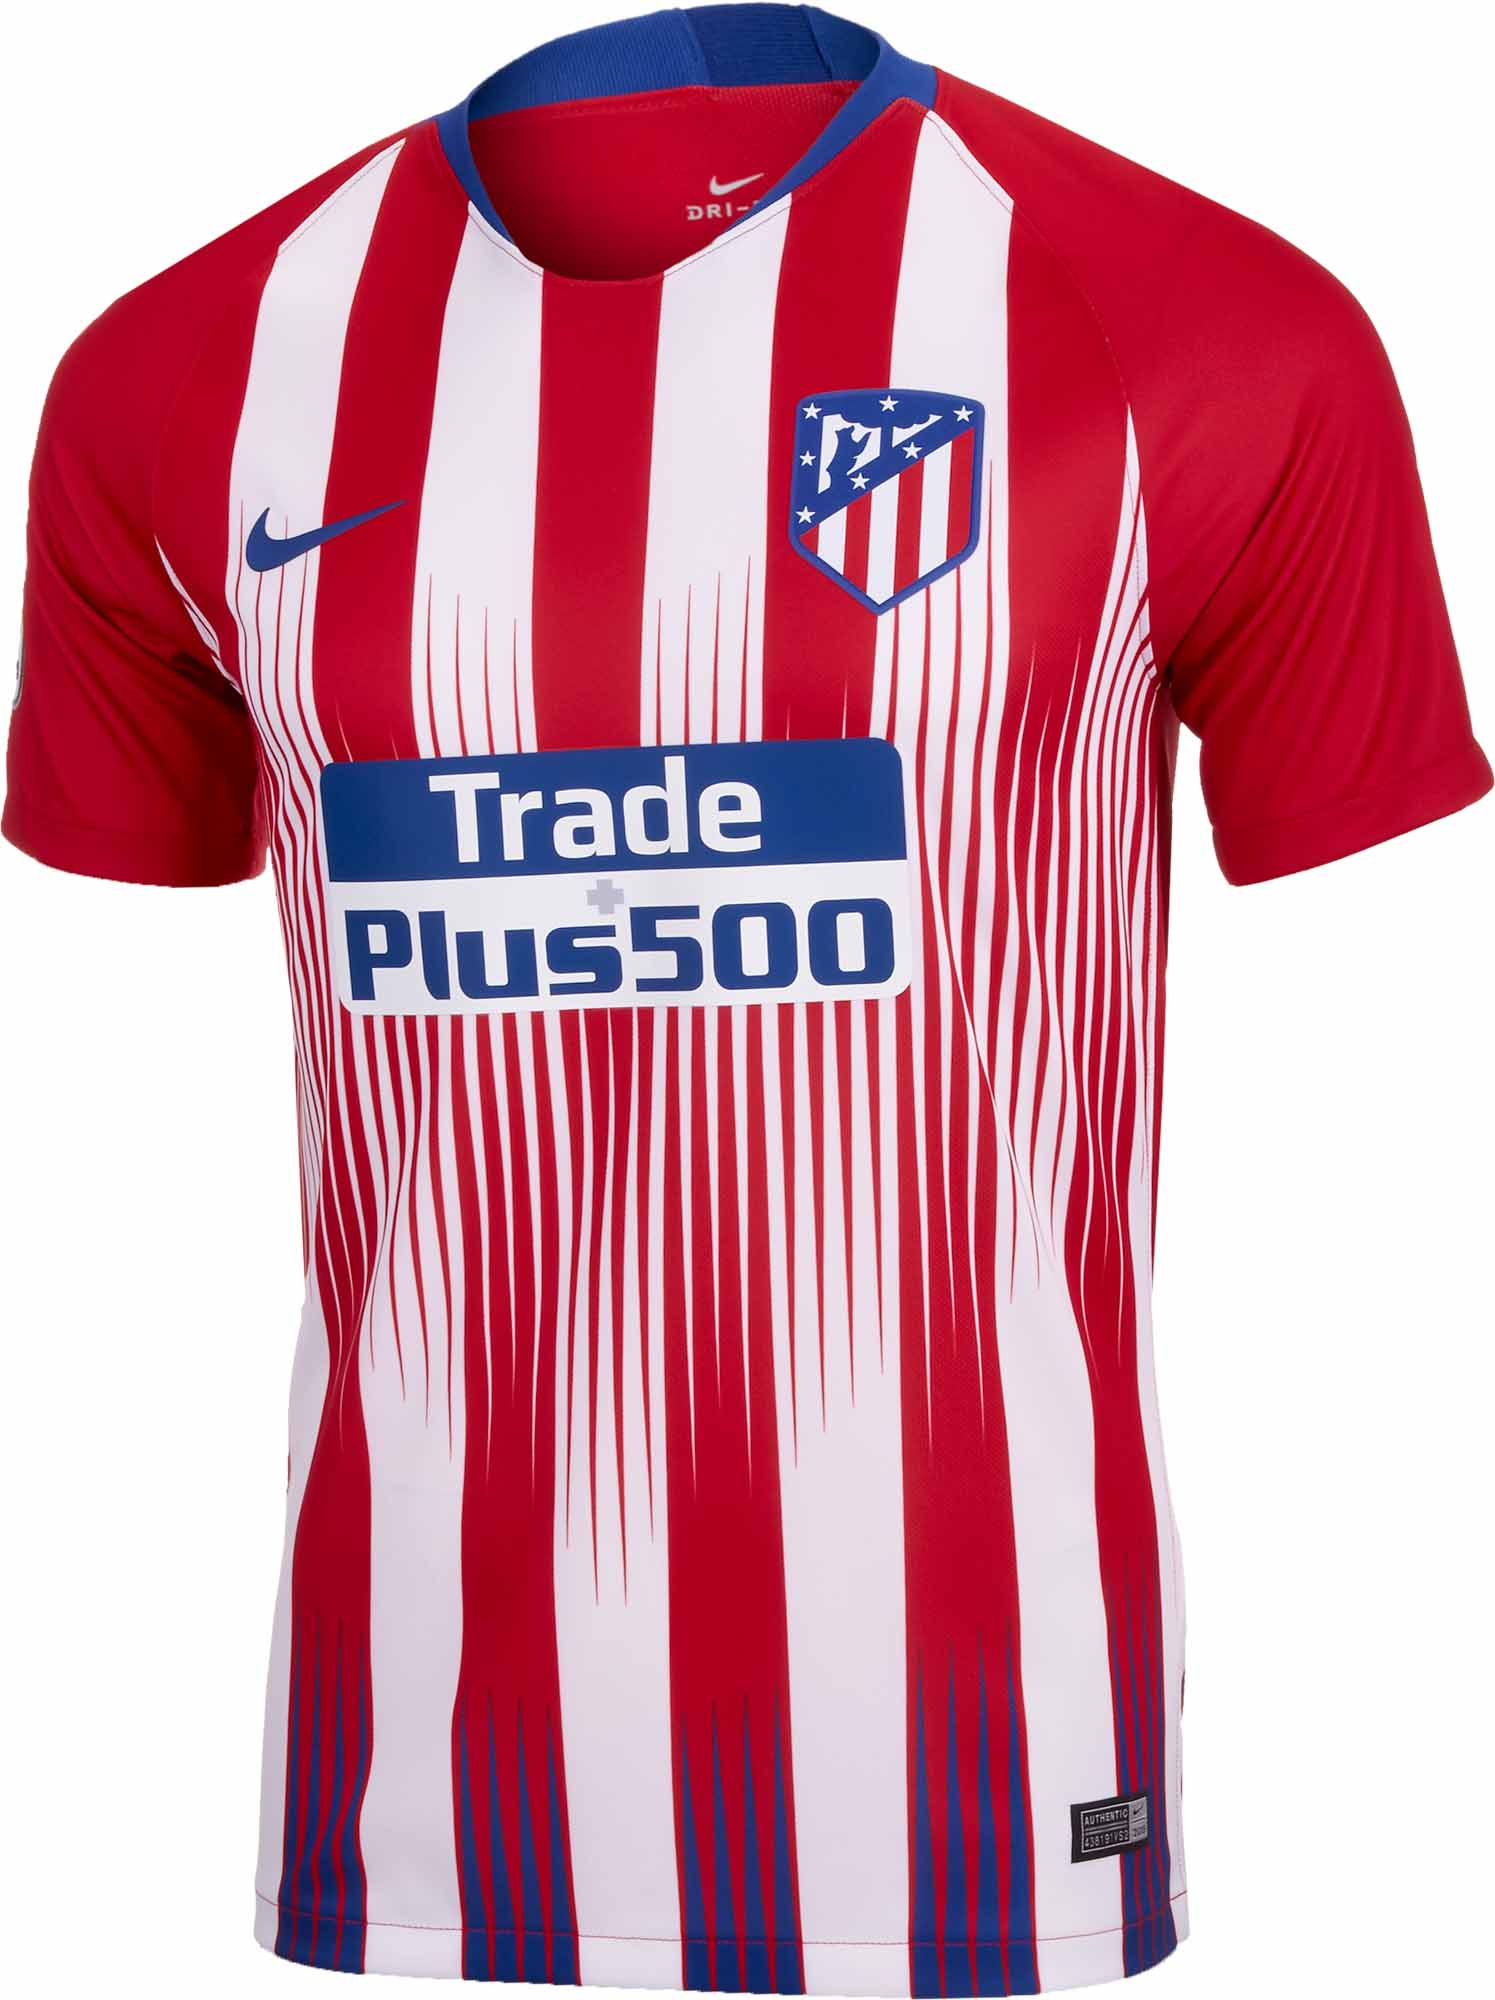 Nike Atletico Madrid Home Jersey 2018-19 - SoccerPro 04f3681f7